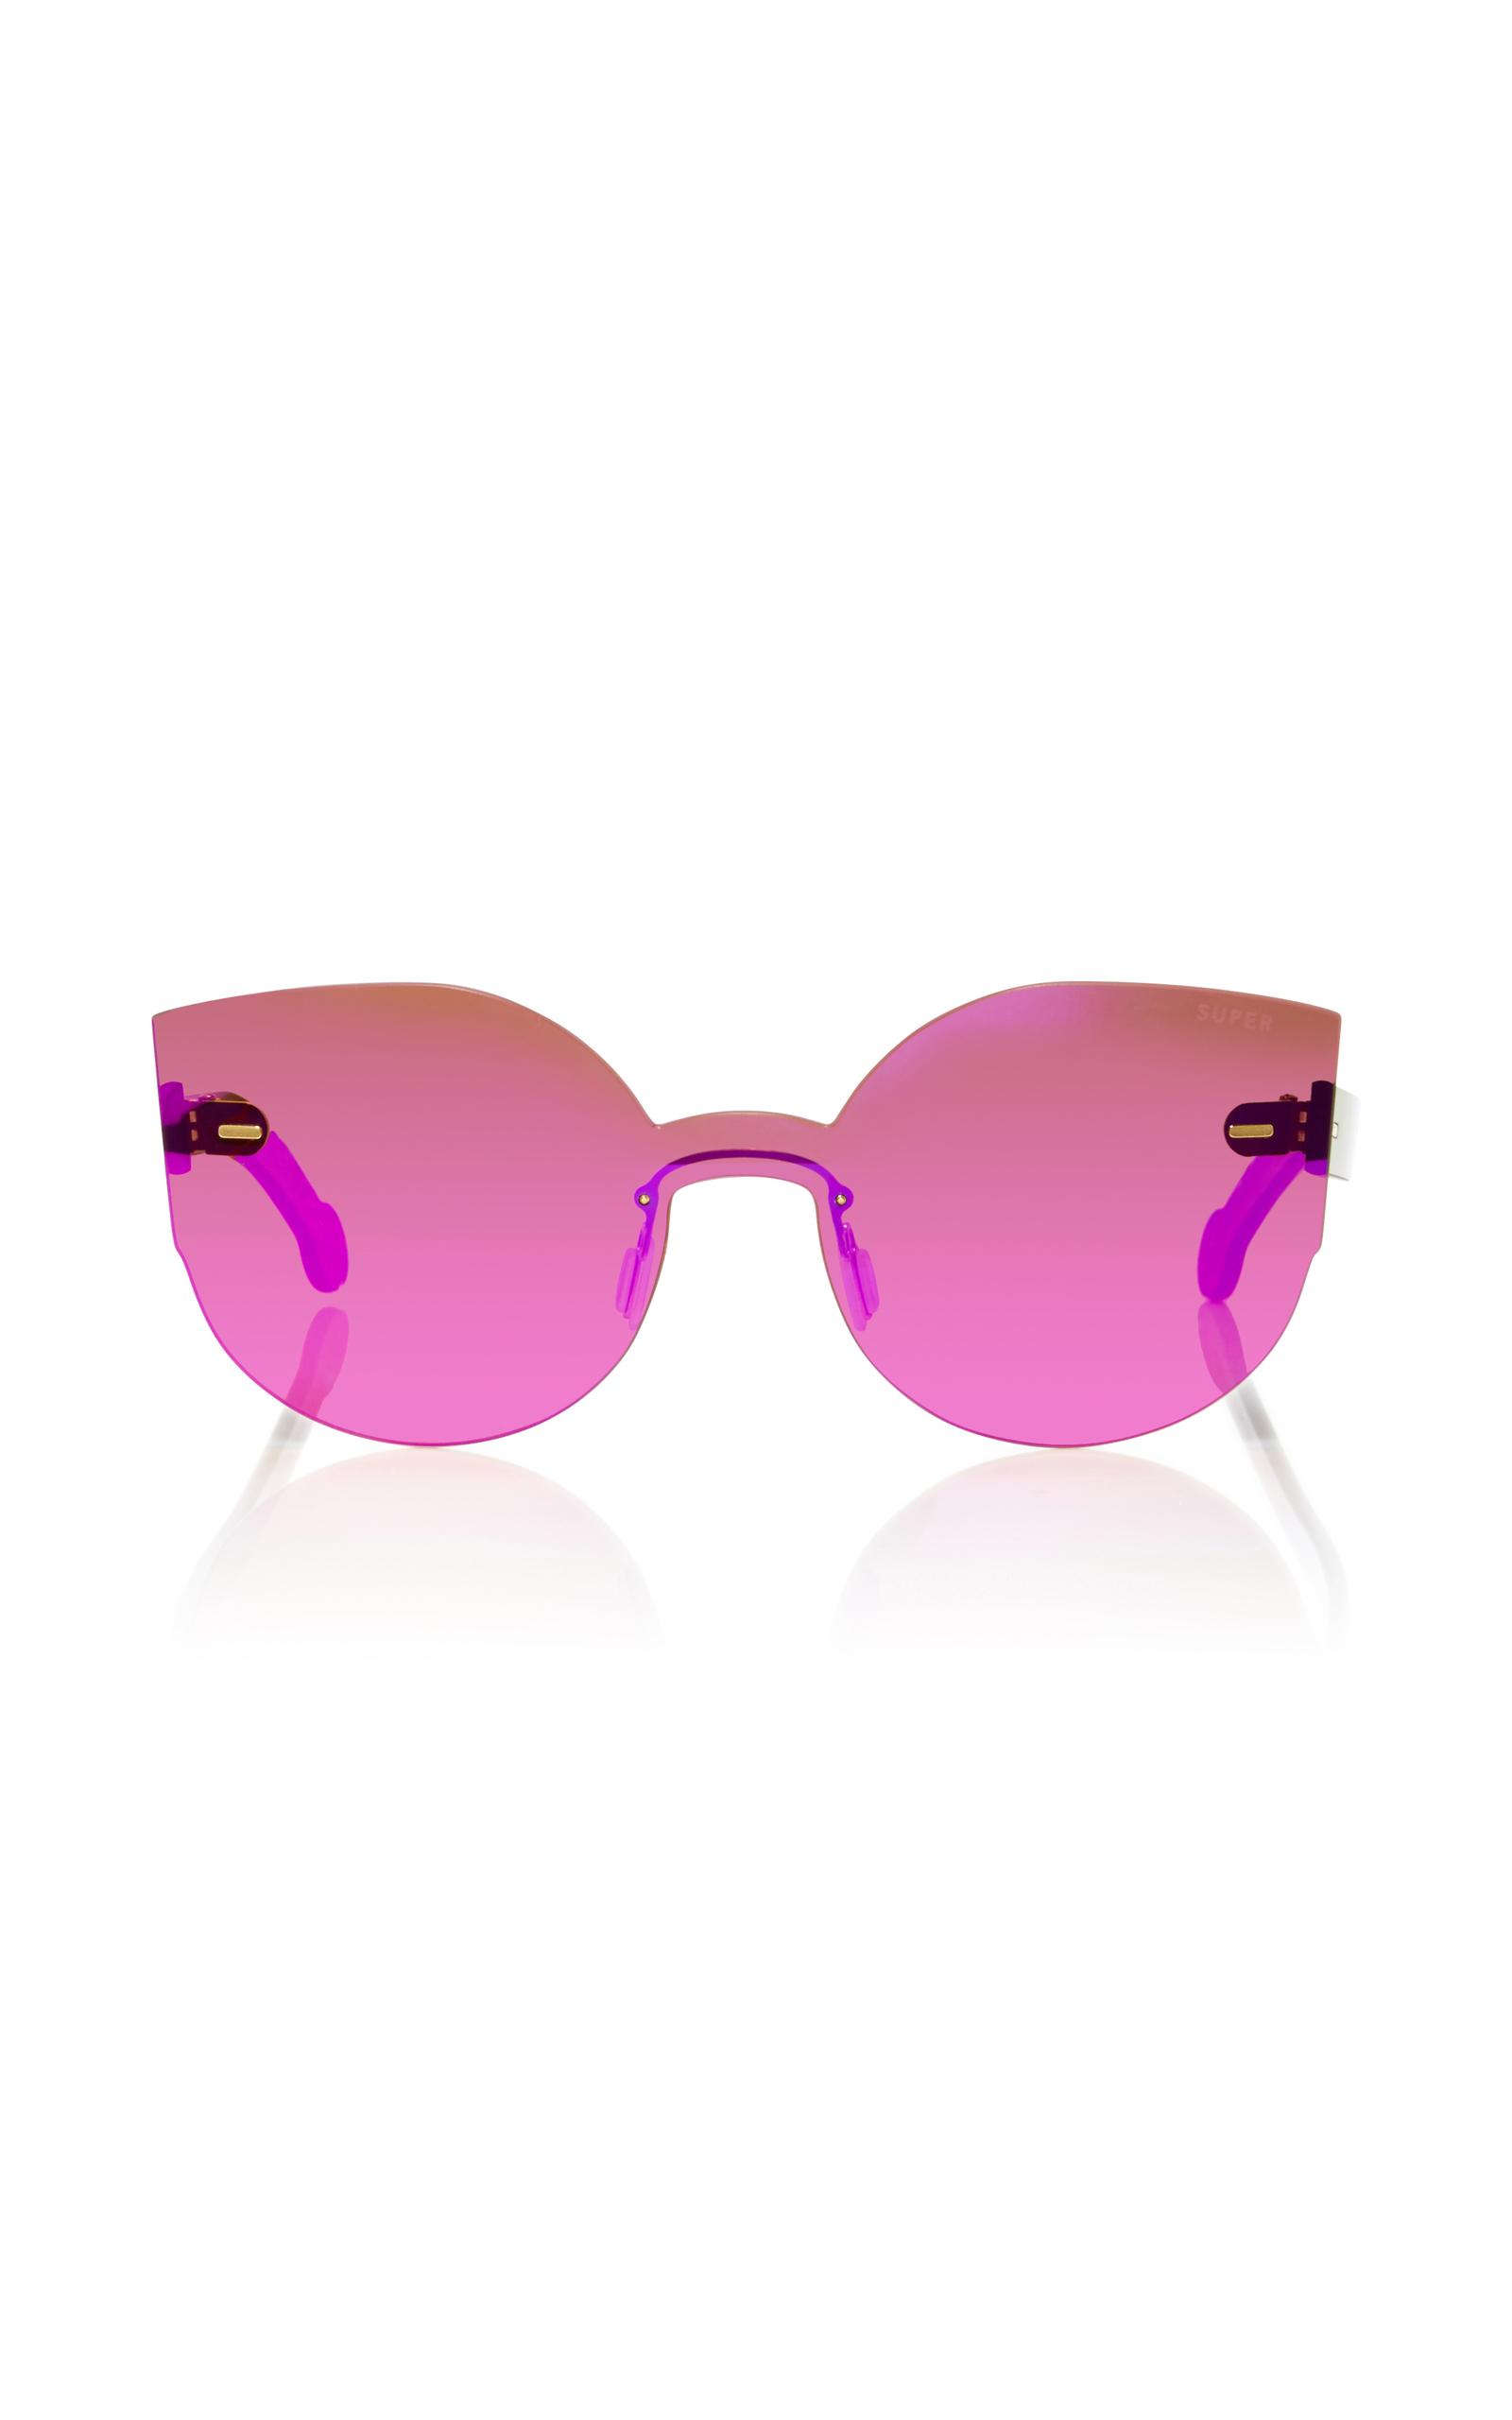 Embellished Lucia sunglasses - Pink & Purple Retro Superfuture wQFsU